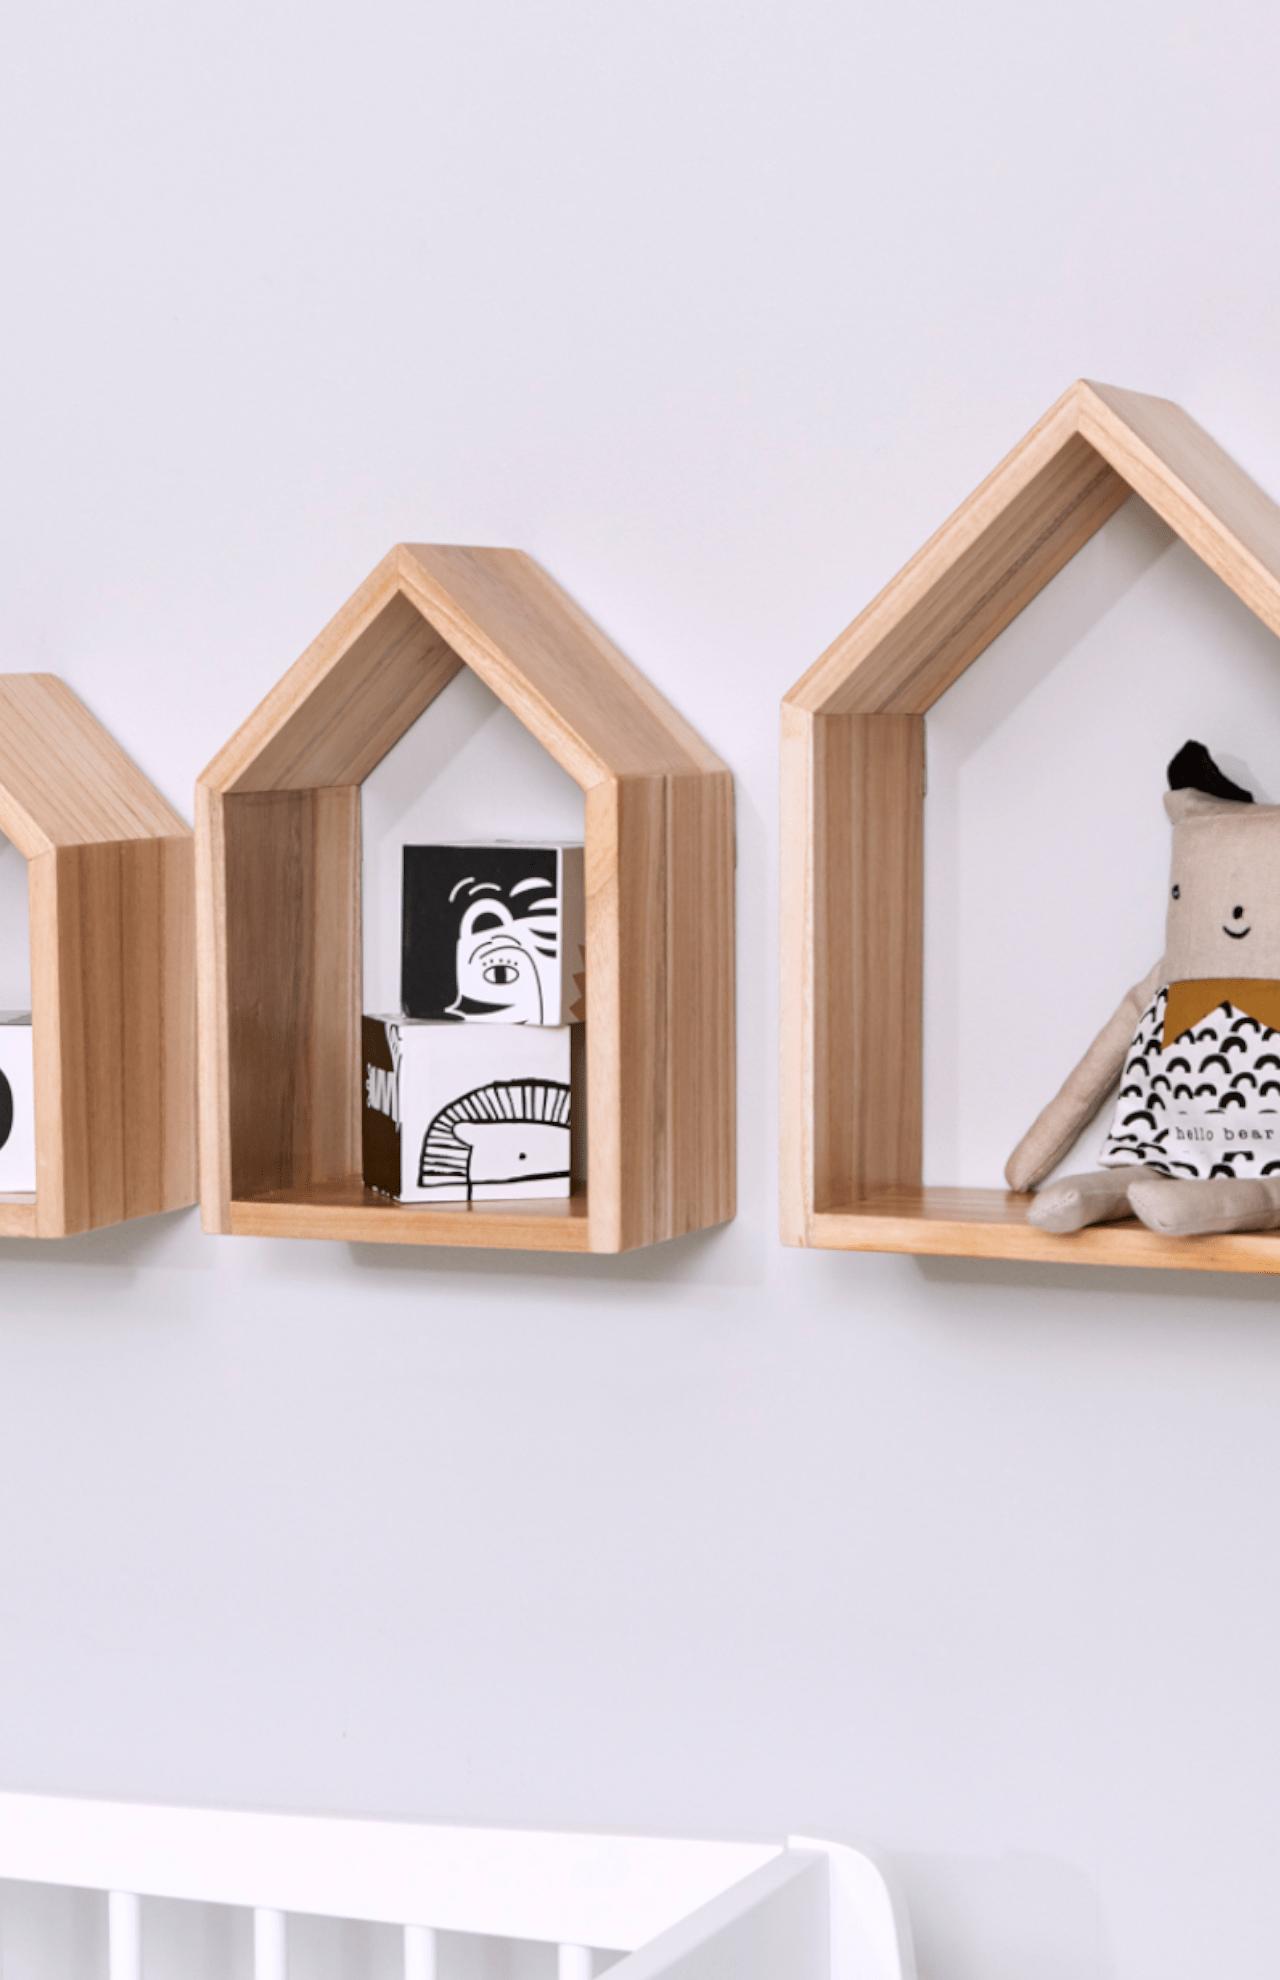 Kids Bedroom House Shaped Shelf Or Wooden House Shelf Nursery Shelf House Shelves Nursery Shelves Shelves